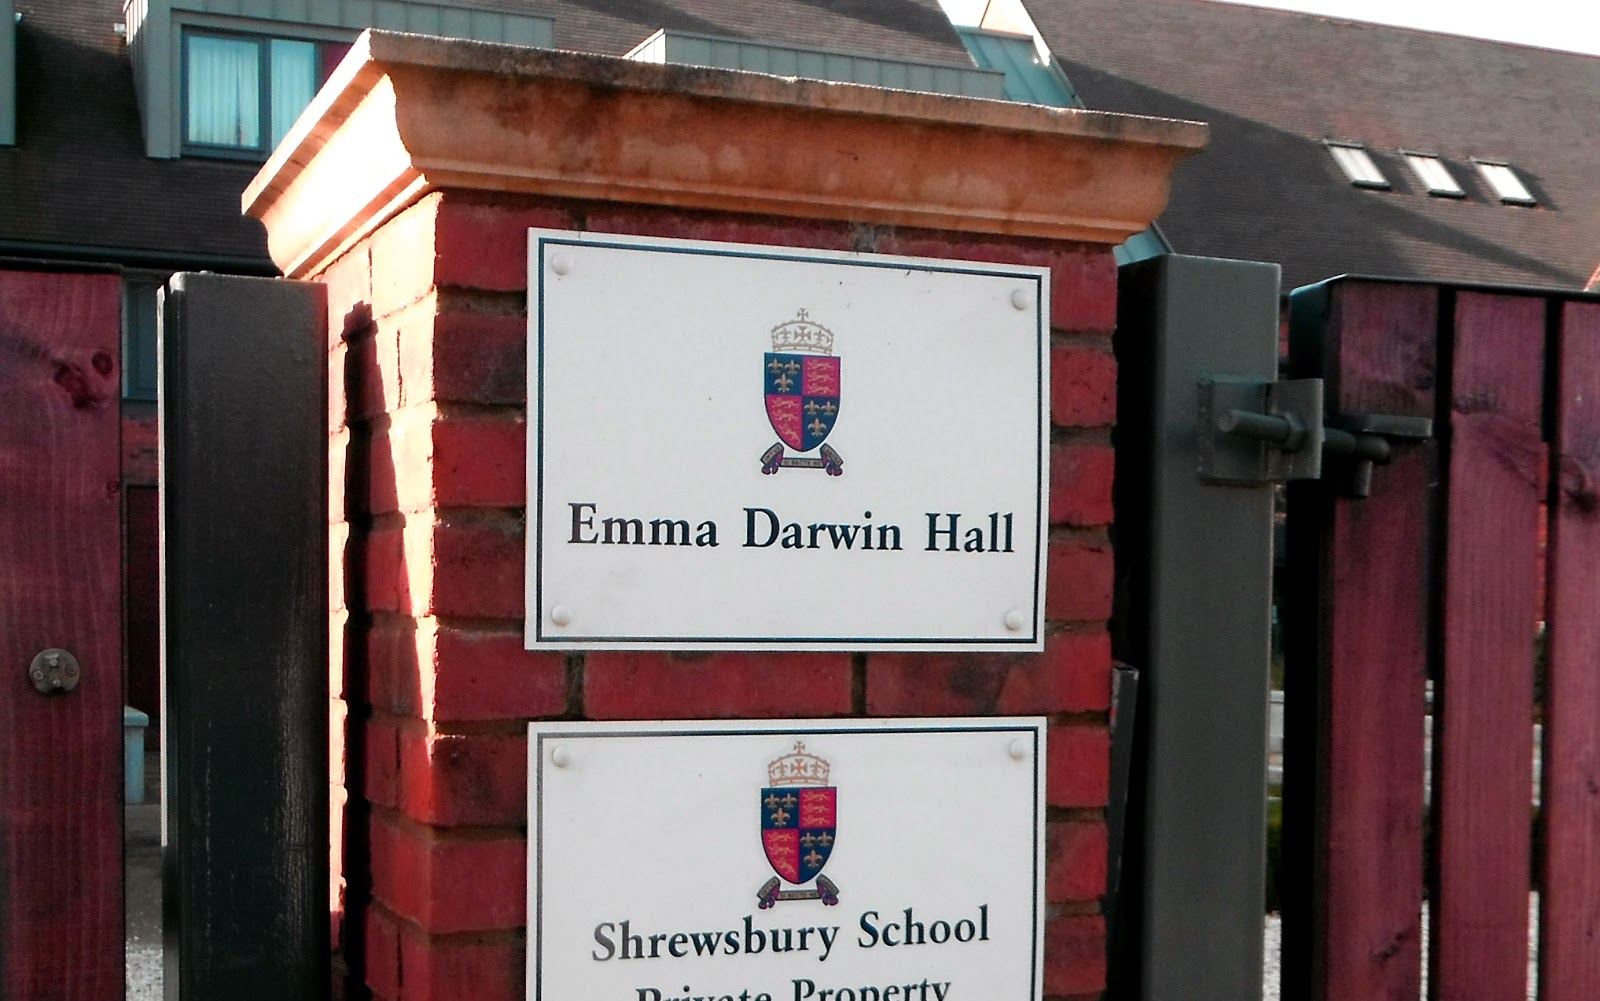 Emma Darwin Hall